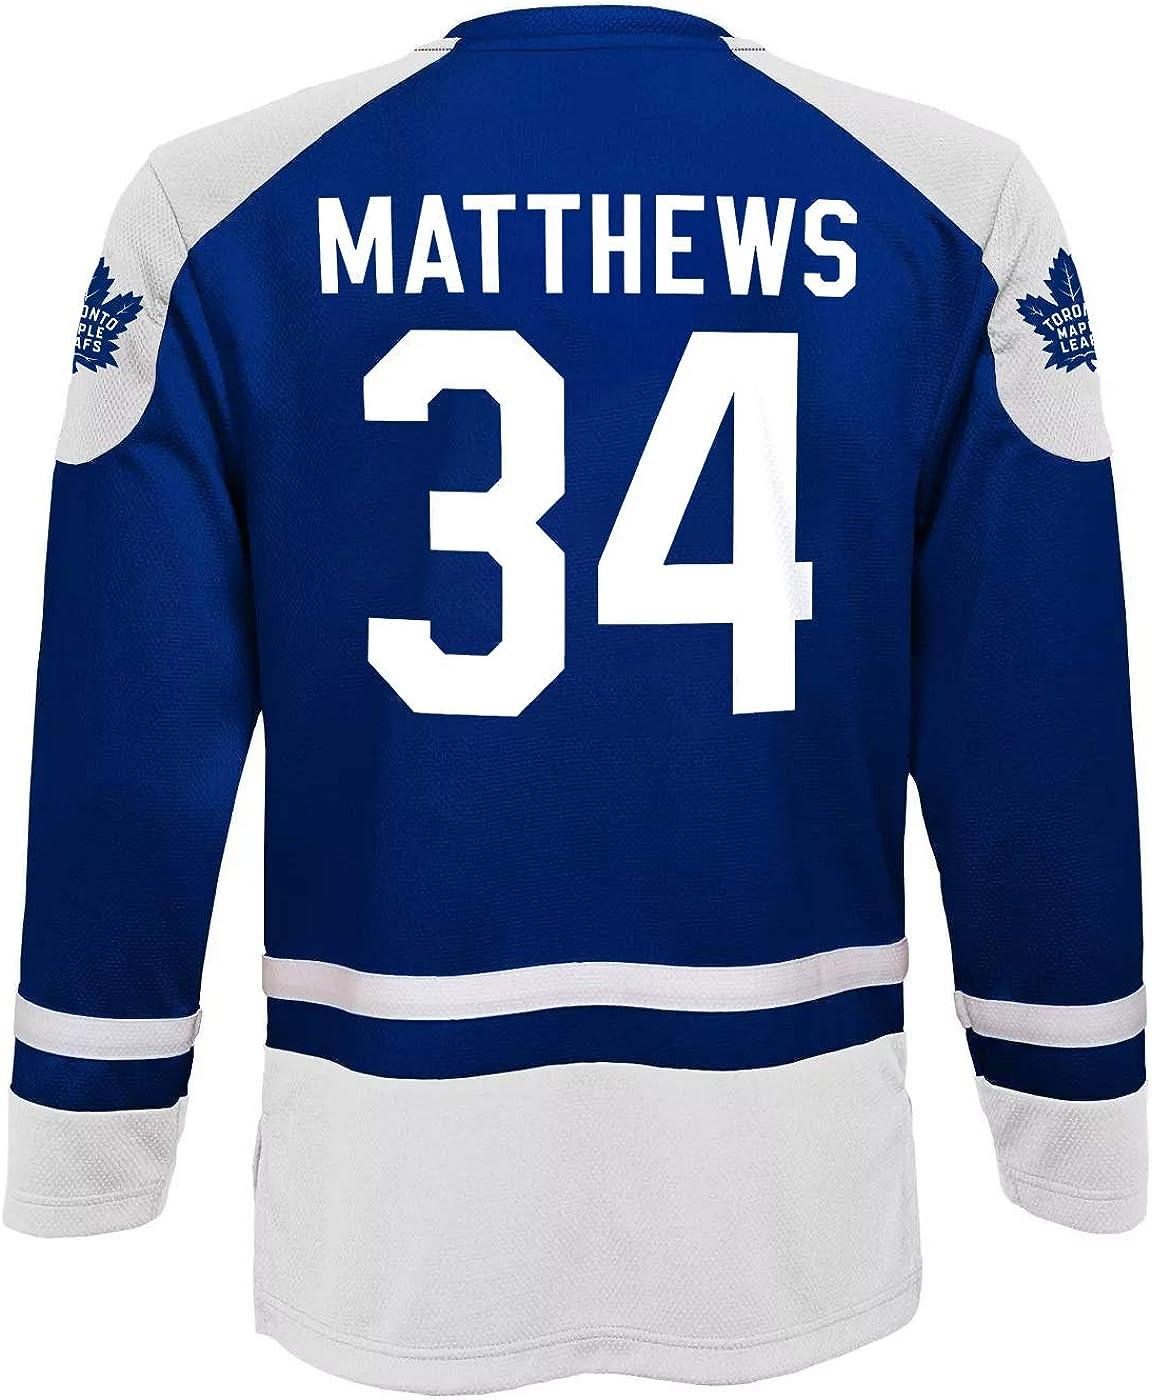 Auston Matthews Toronto Maple Leafs Kids 4-7 Blue Long Sleeve Jersey